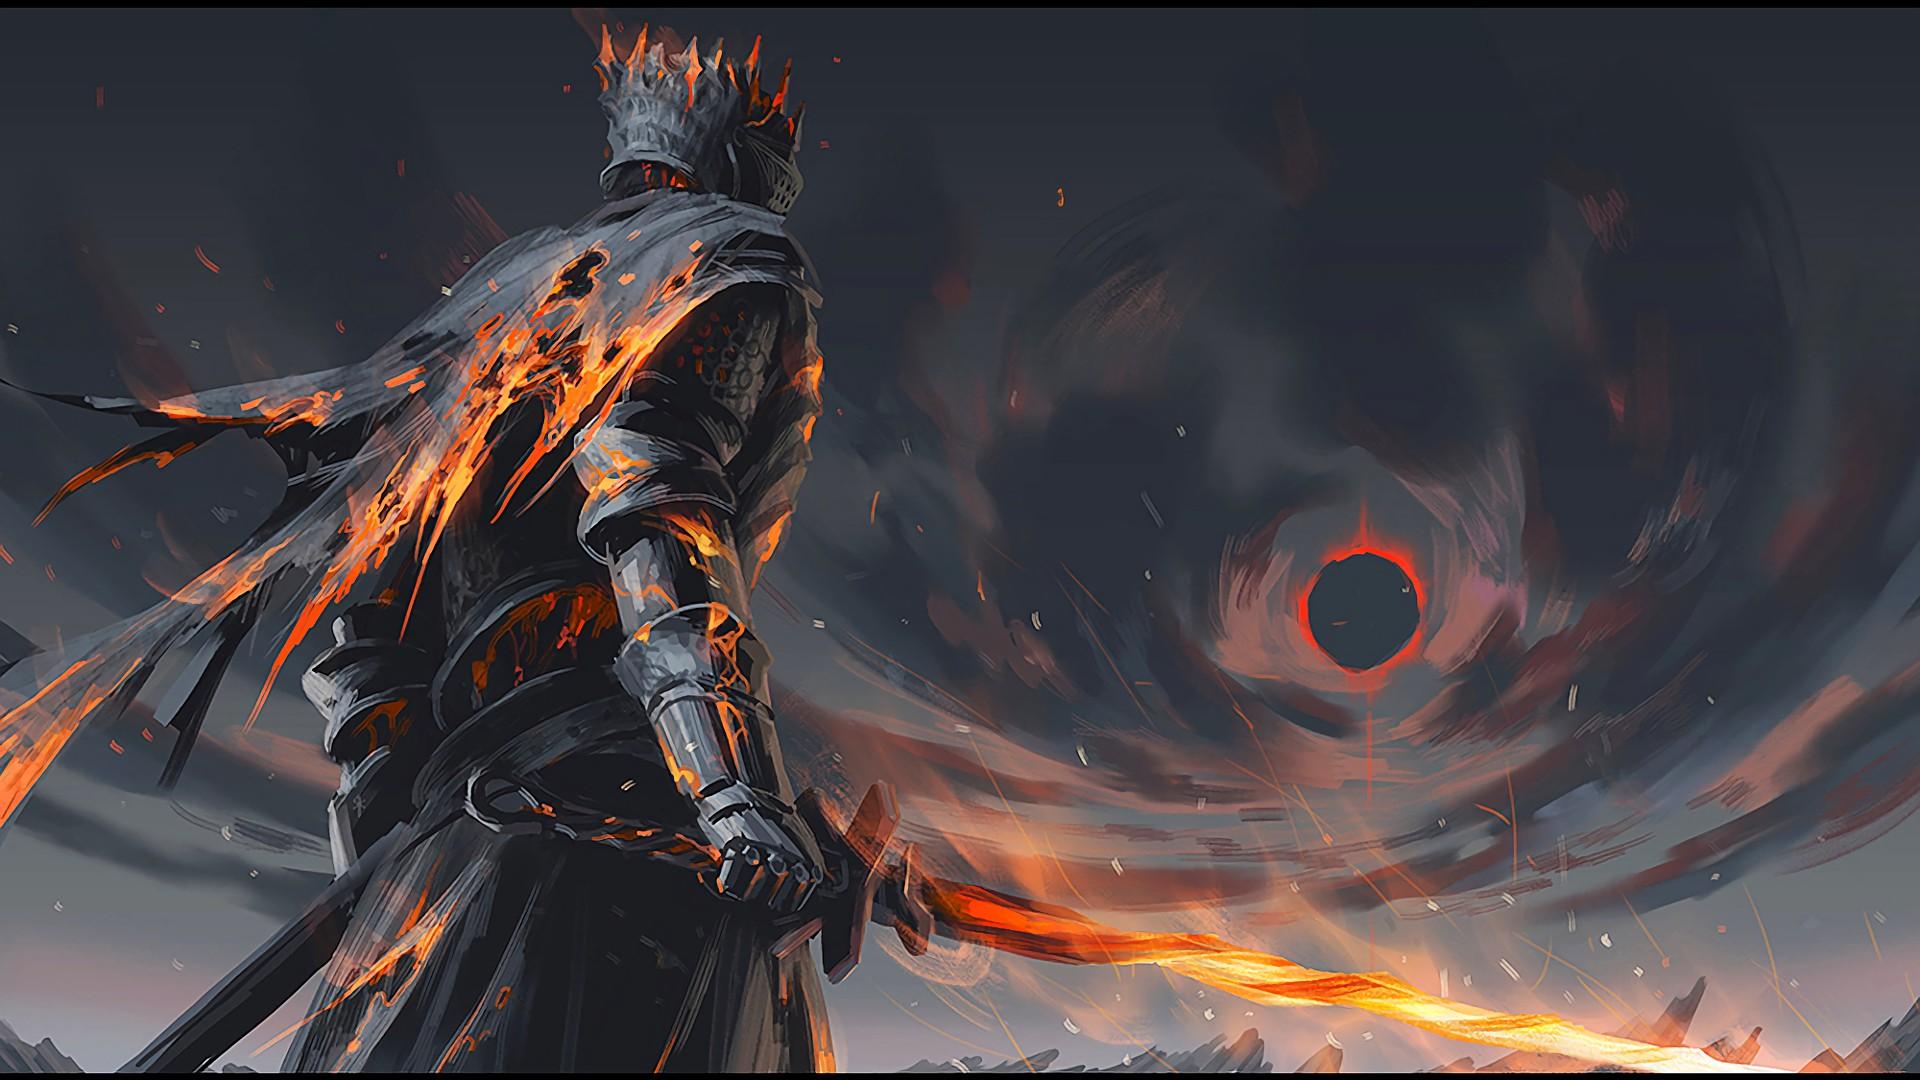 General 1920x1080 fantasy art warrior Dark Souls III Dark Souls video games sword video game art game art artwork